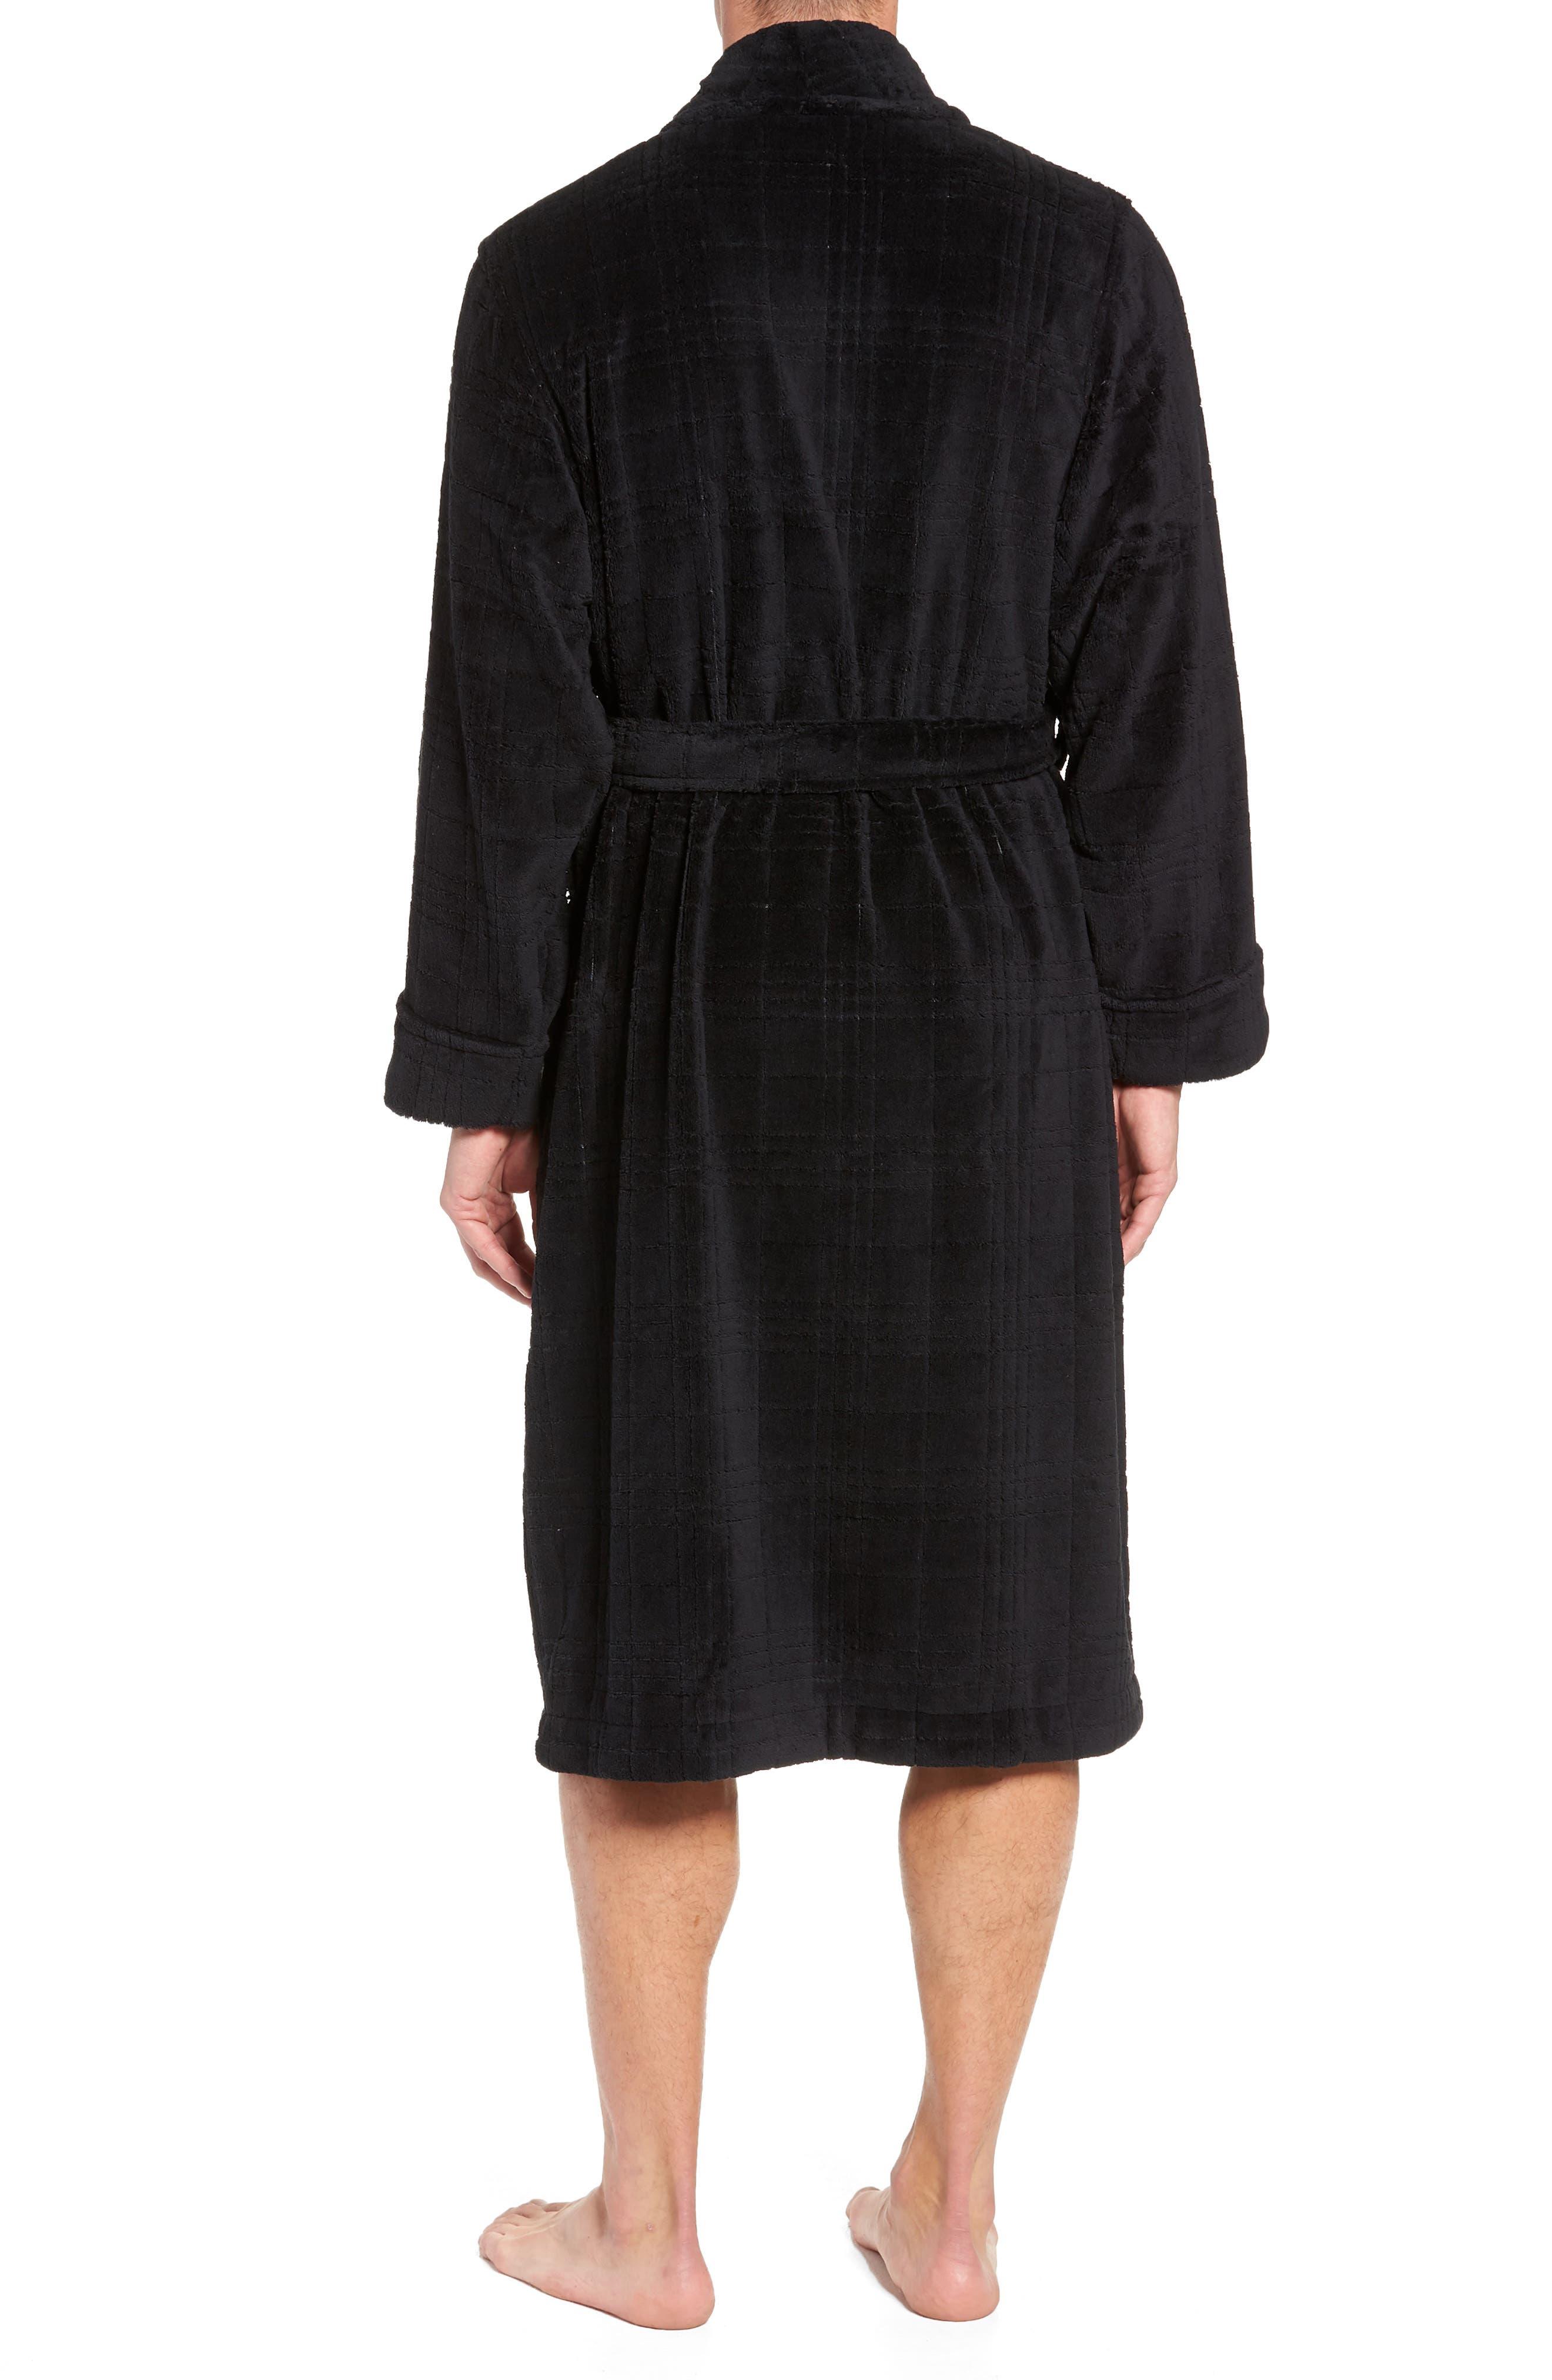 NORDSTROM MEN'S SHOP, Shadow Plaid Fleece Robe, Alternate thumbnail 2, color, BLACK